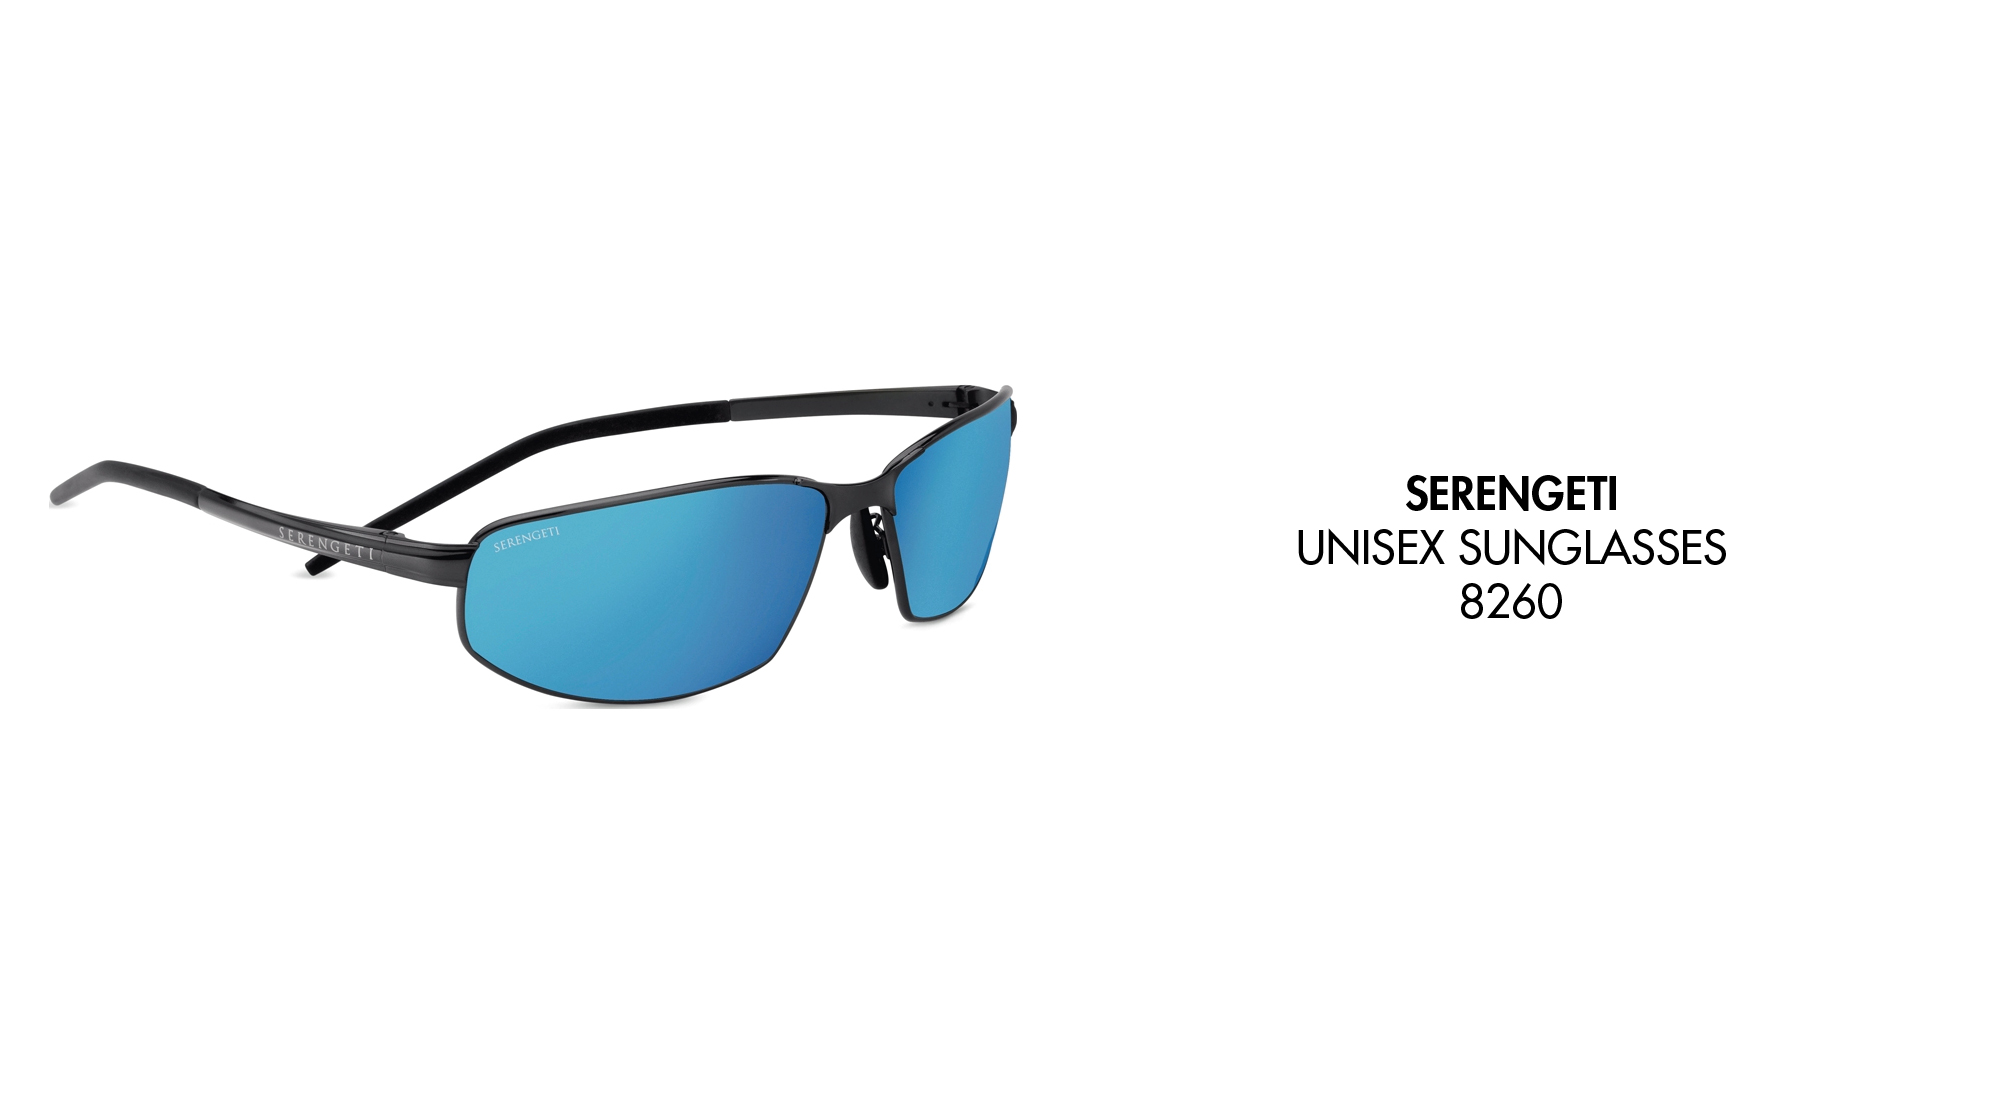 704183c4a68 Serengeti 7316 Nuvino Shiny Brown Polarized PhD Drivers Sunglasses- £119